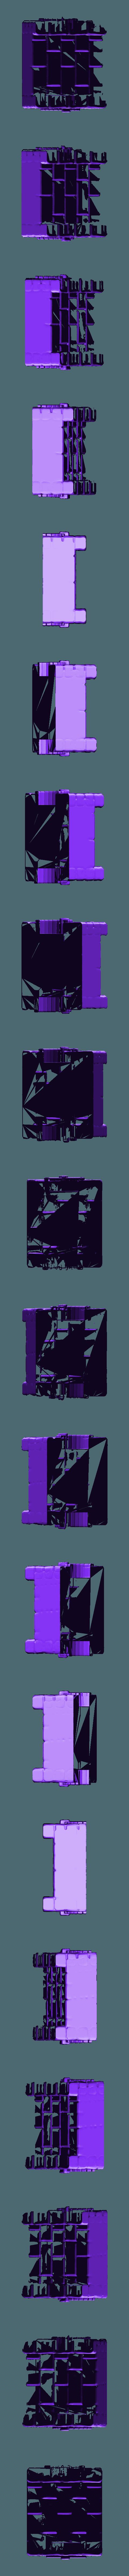 raisedsmall_drainage.stl Download free STL file Fantasy city set • 3D printable model, HeribertoValle